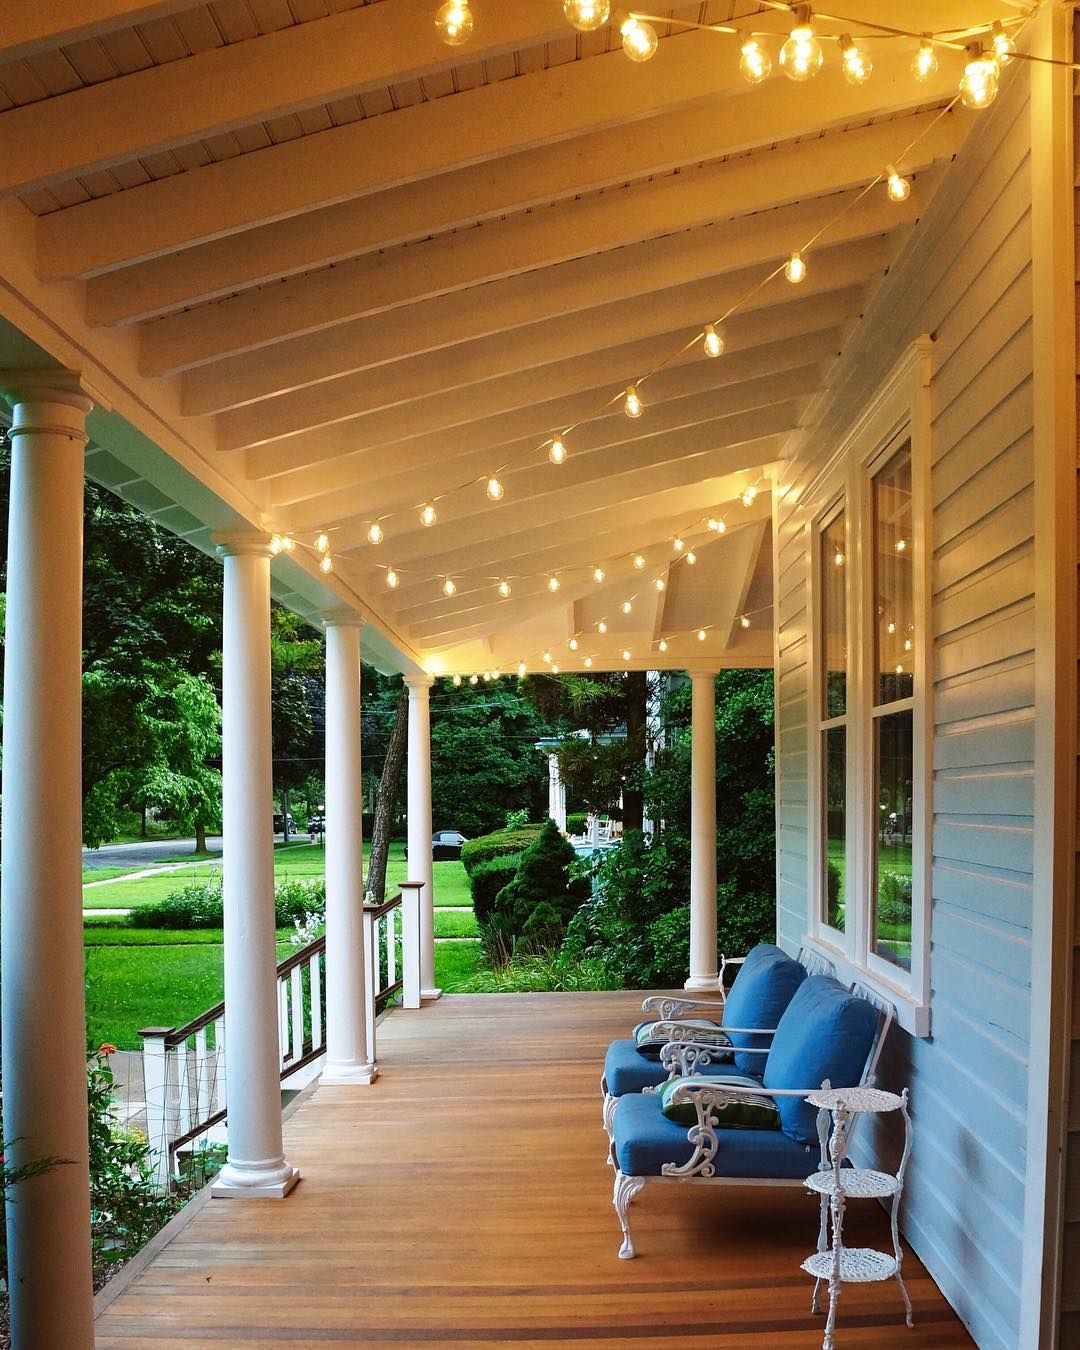 Restored Victorian Wrap Porch. String Cafe Lights